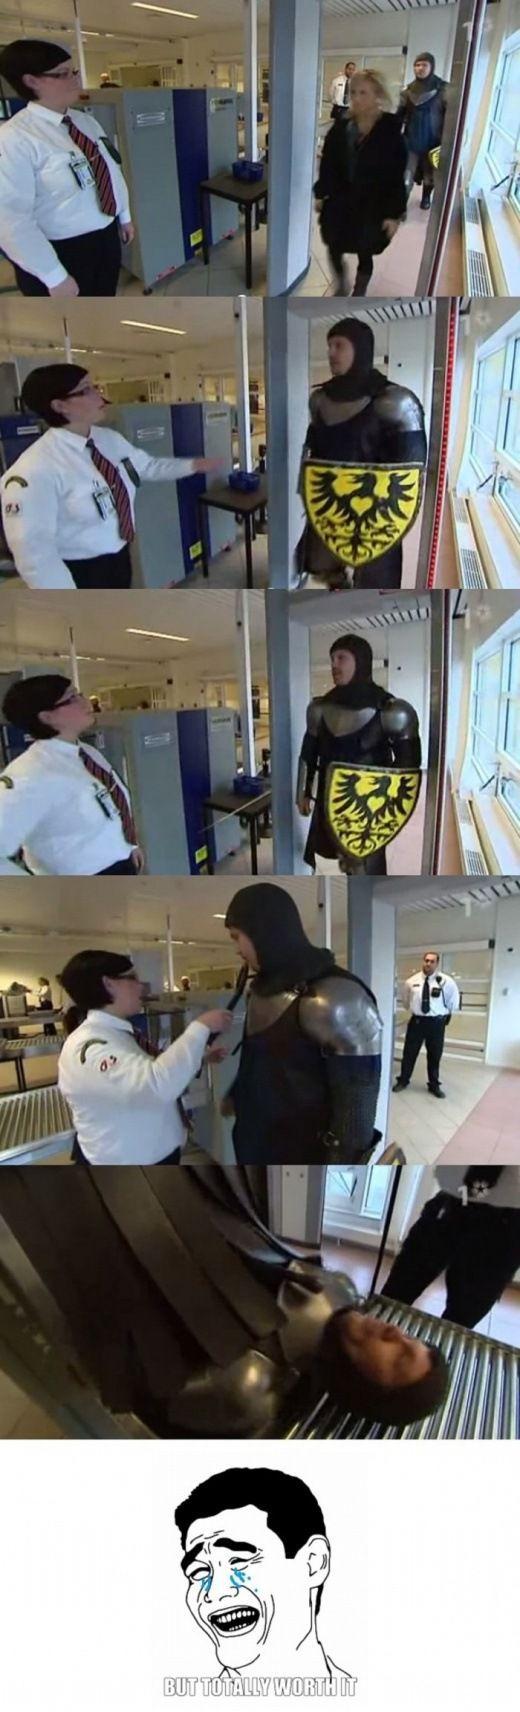 Swedish Airport Troll